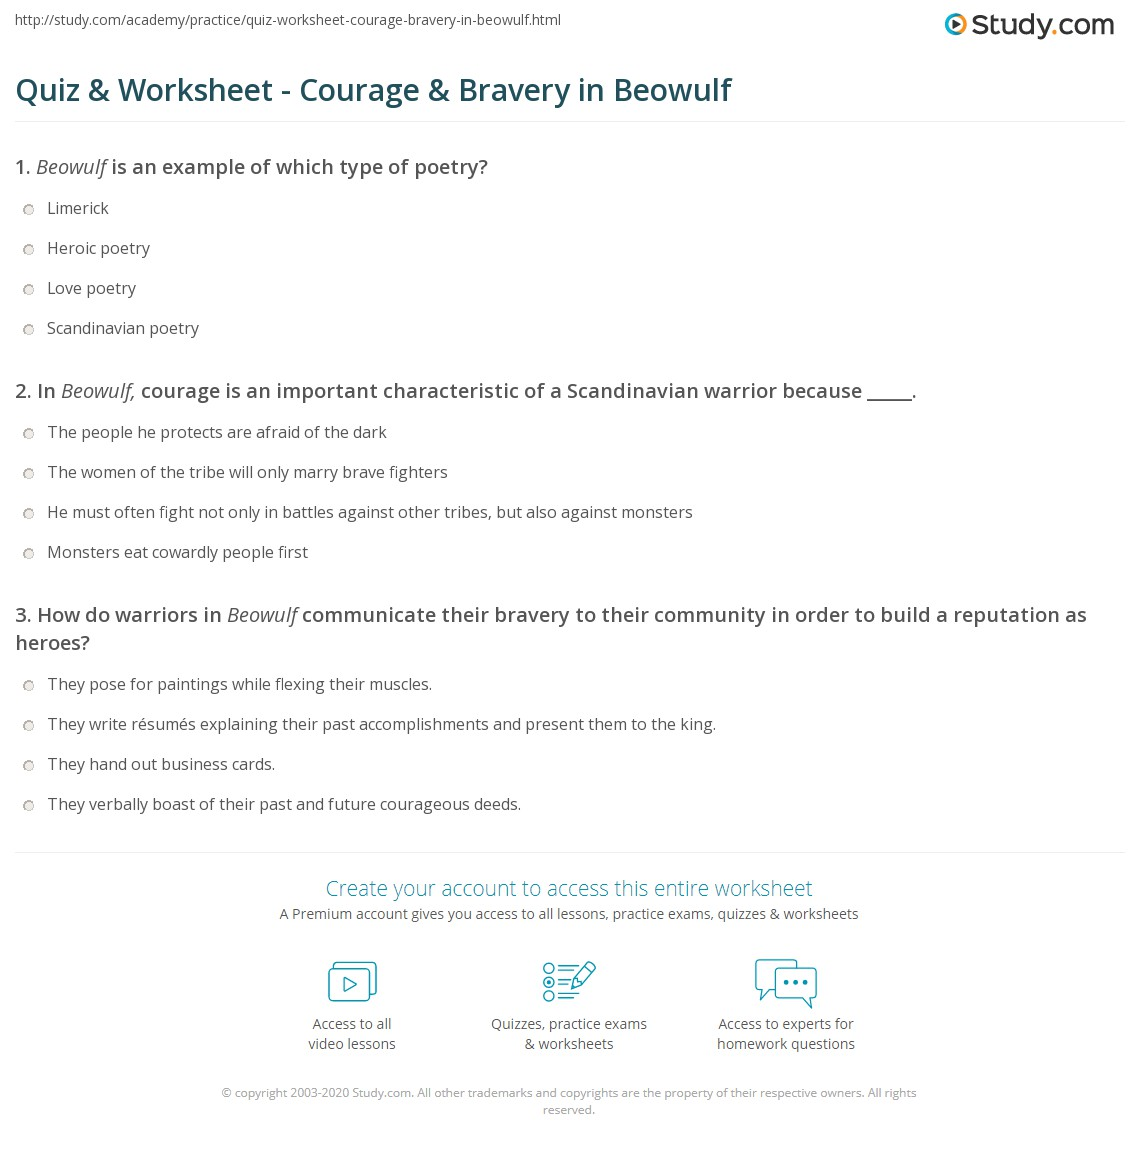 Worksheets Courage Worksheets quiz worksheet courage bravery in beowulf study com print worksheet